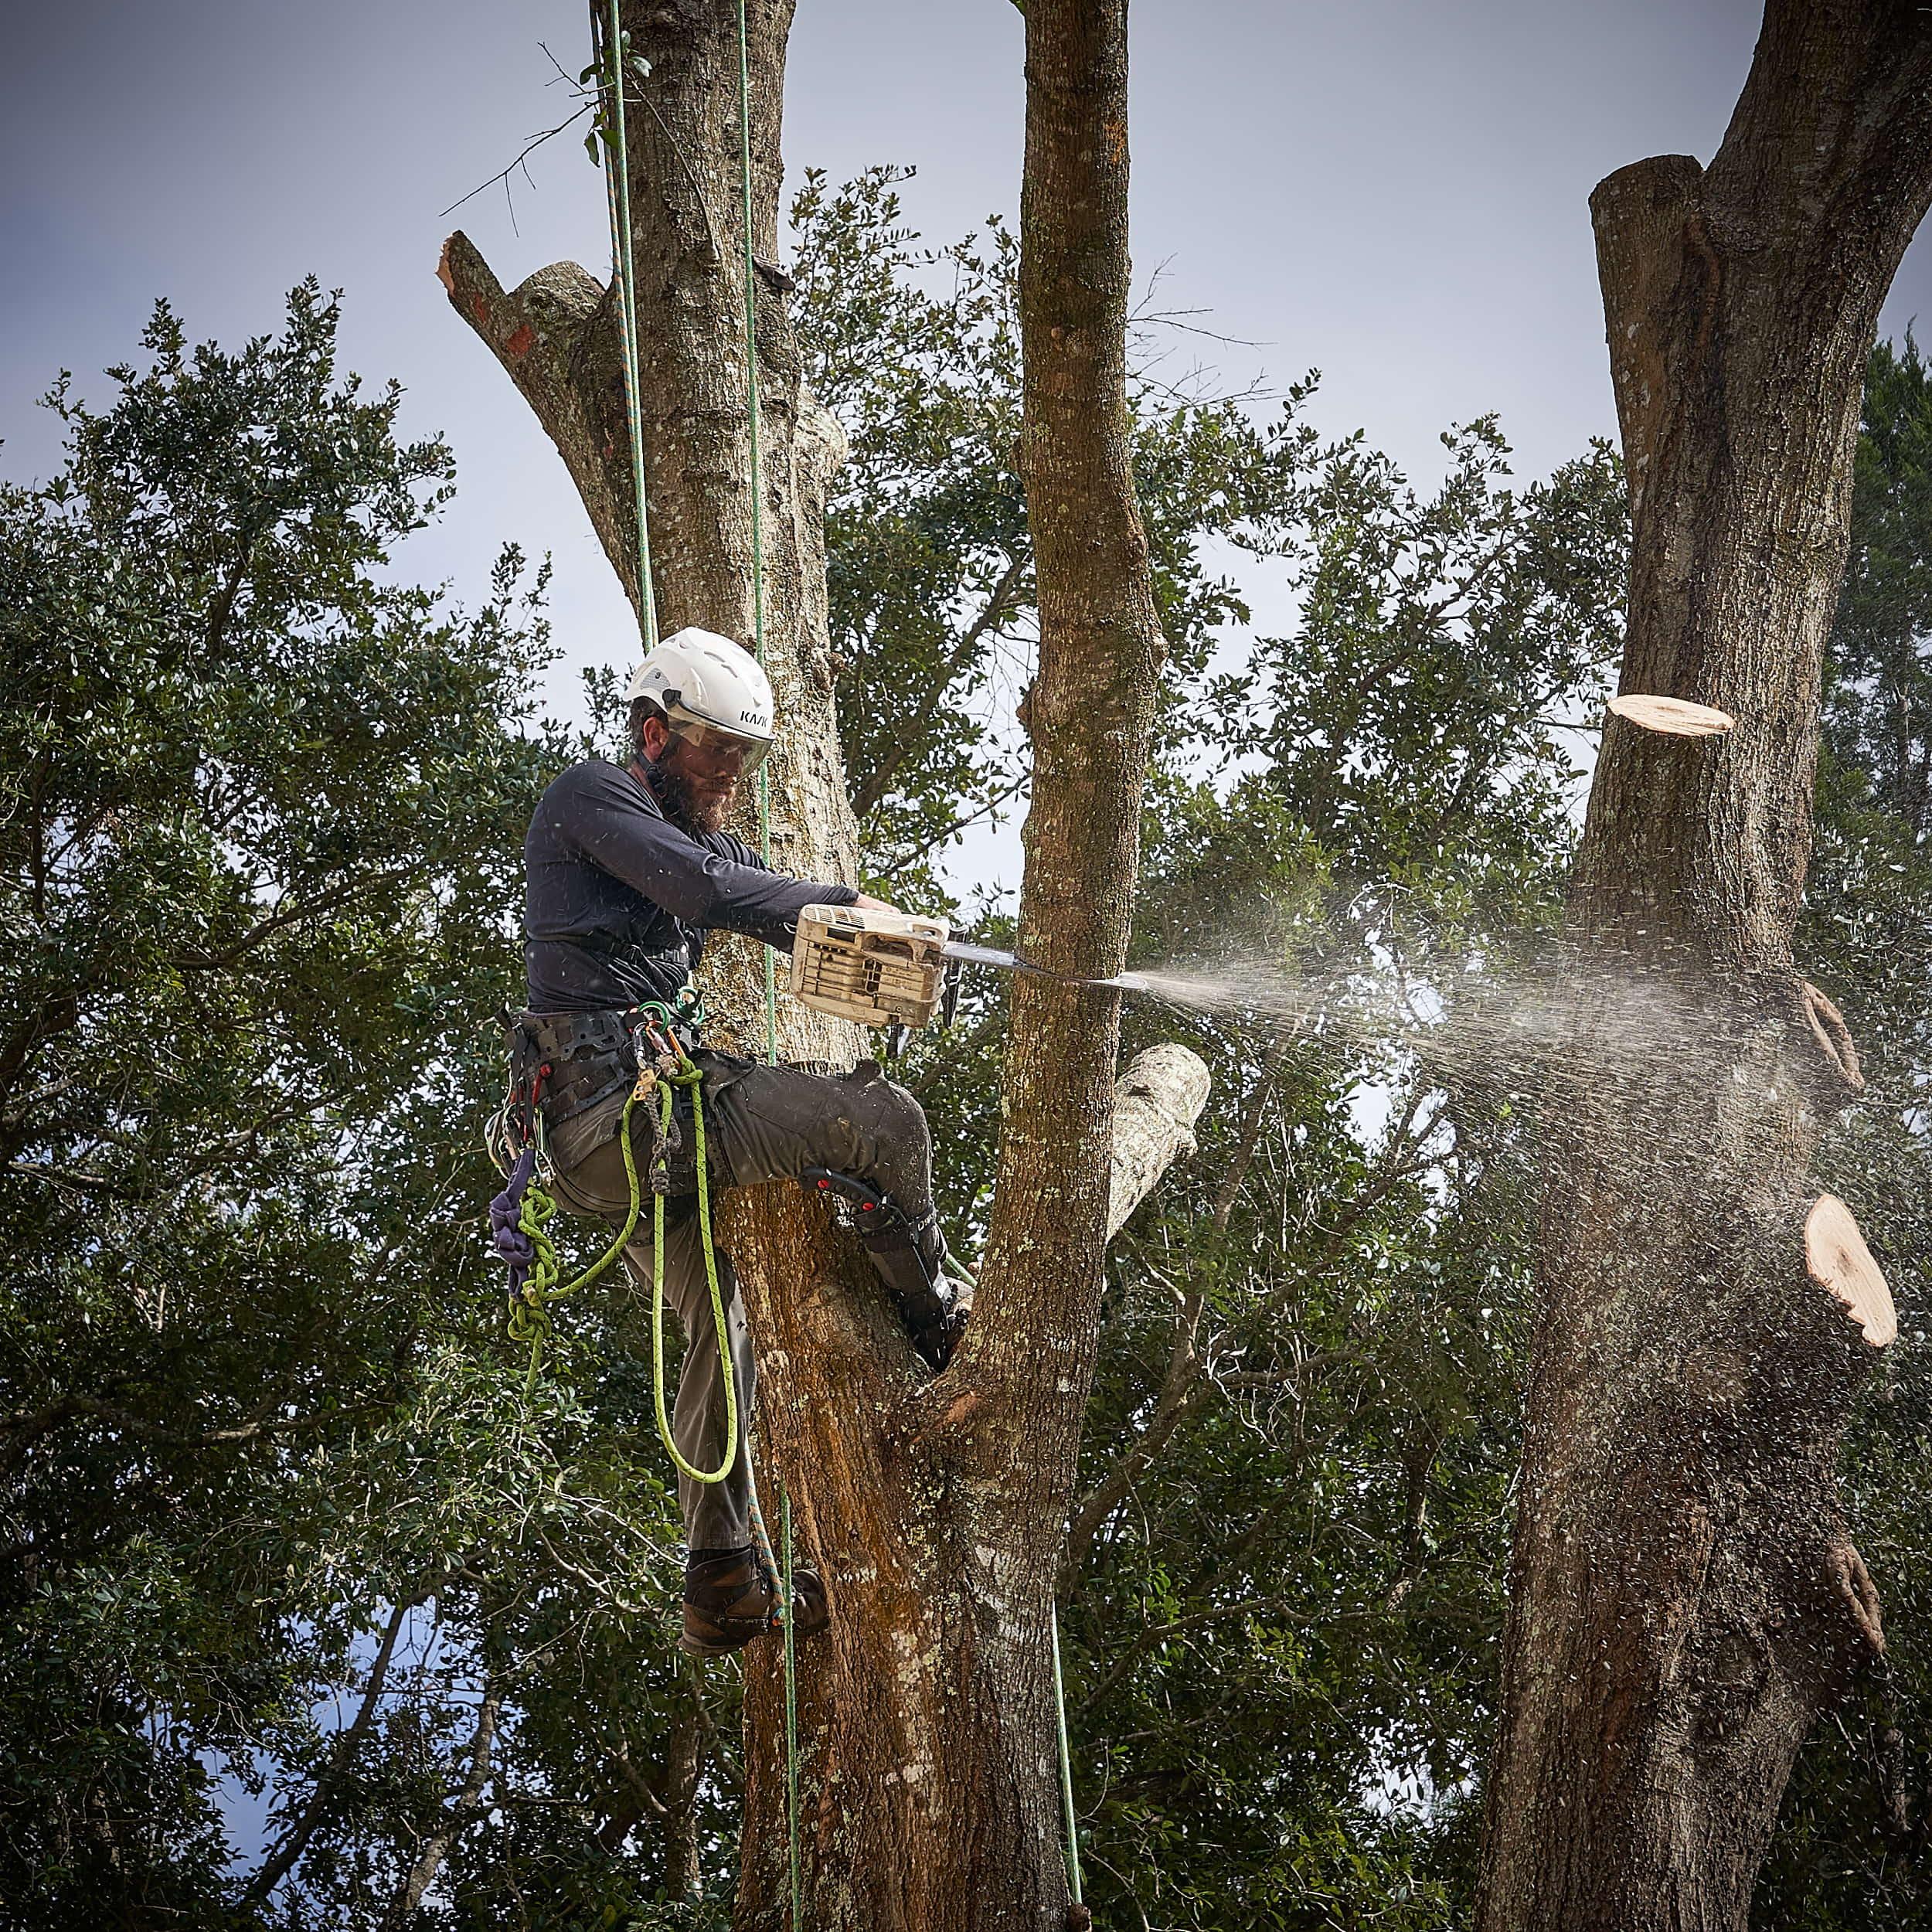 Cutting in the tree